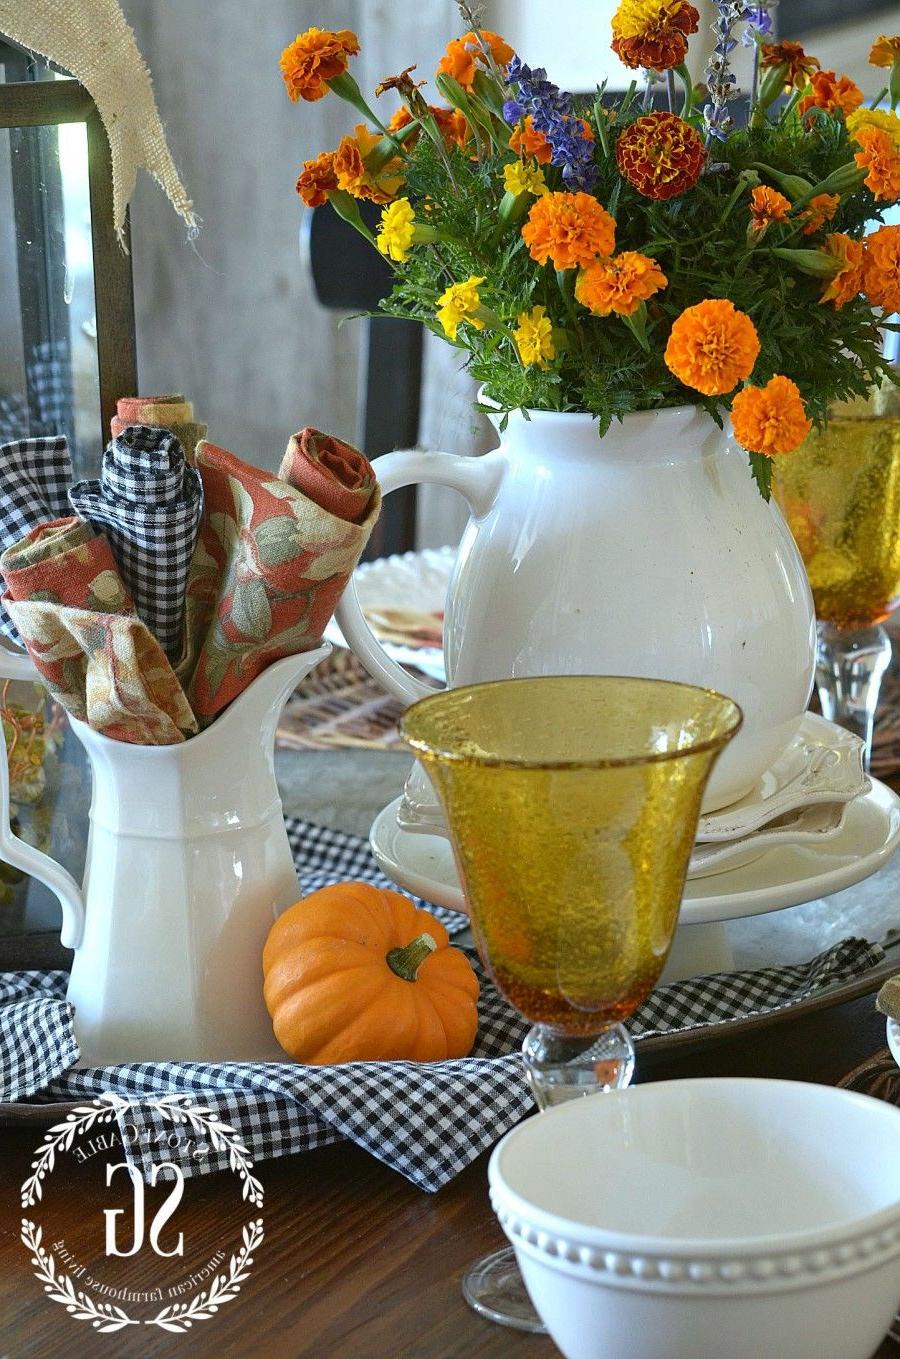 Fall Decor Inspiration To Transform Your Home For The Cozy